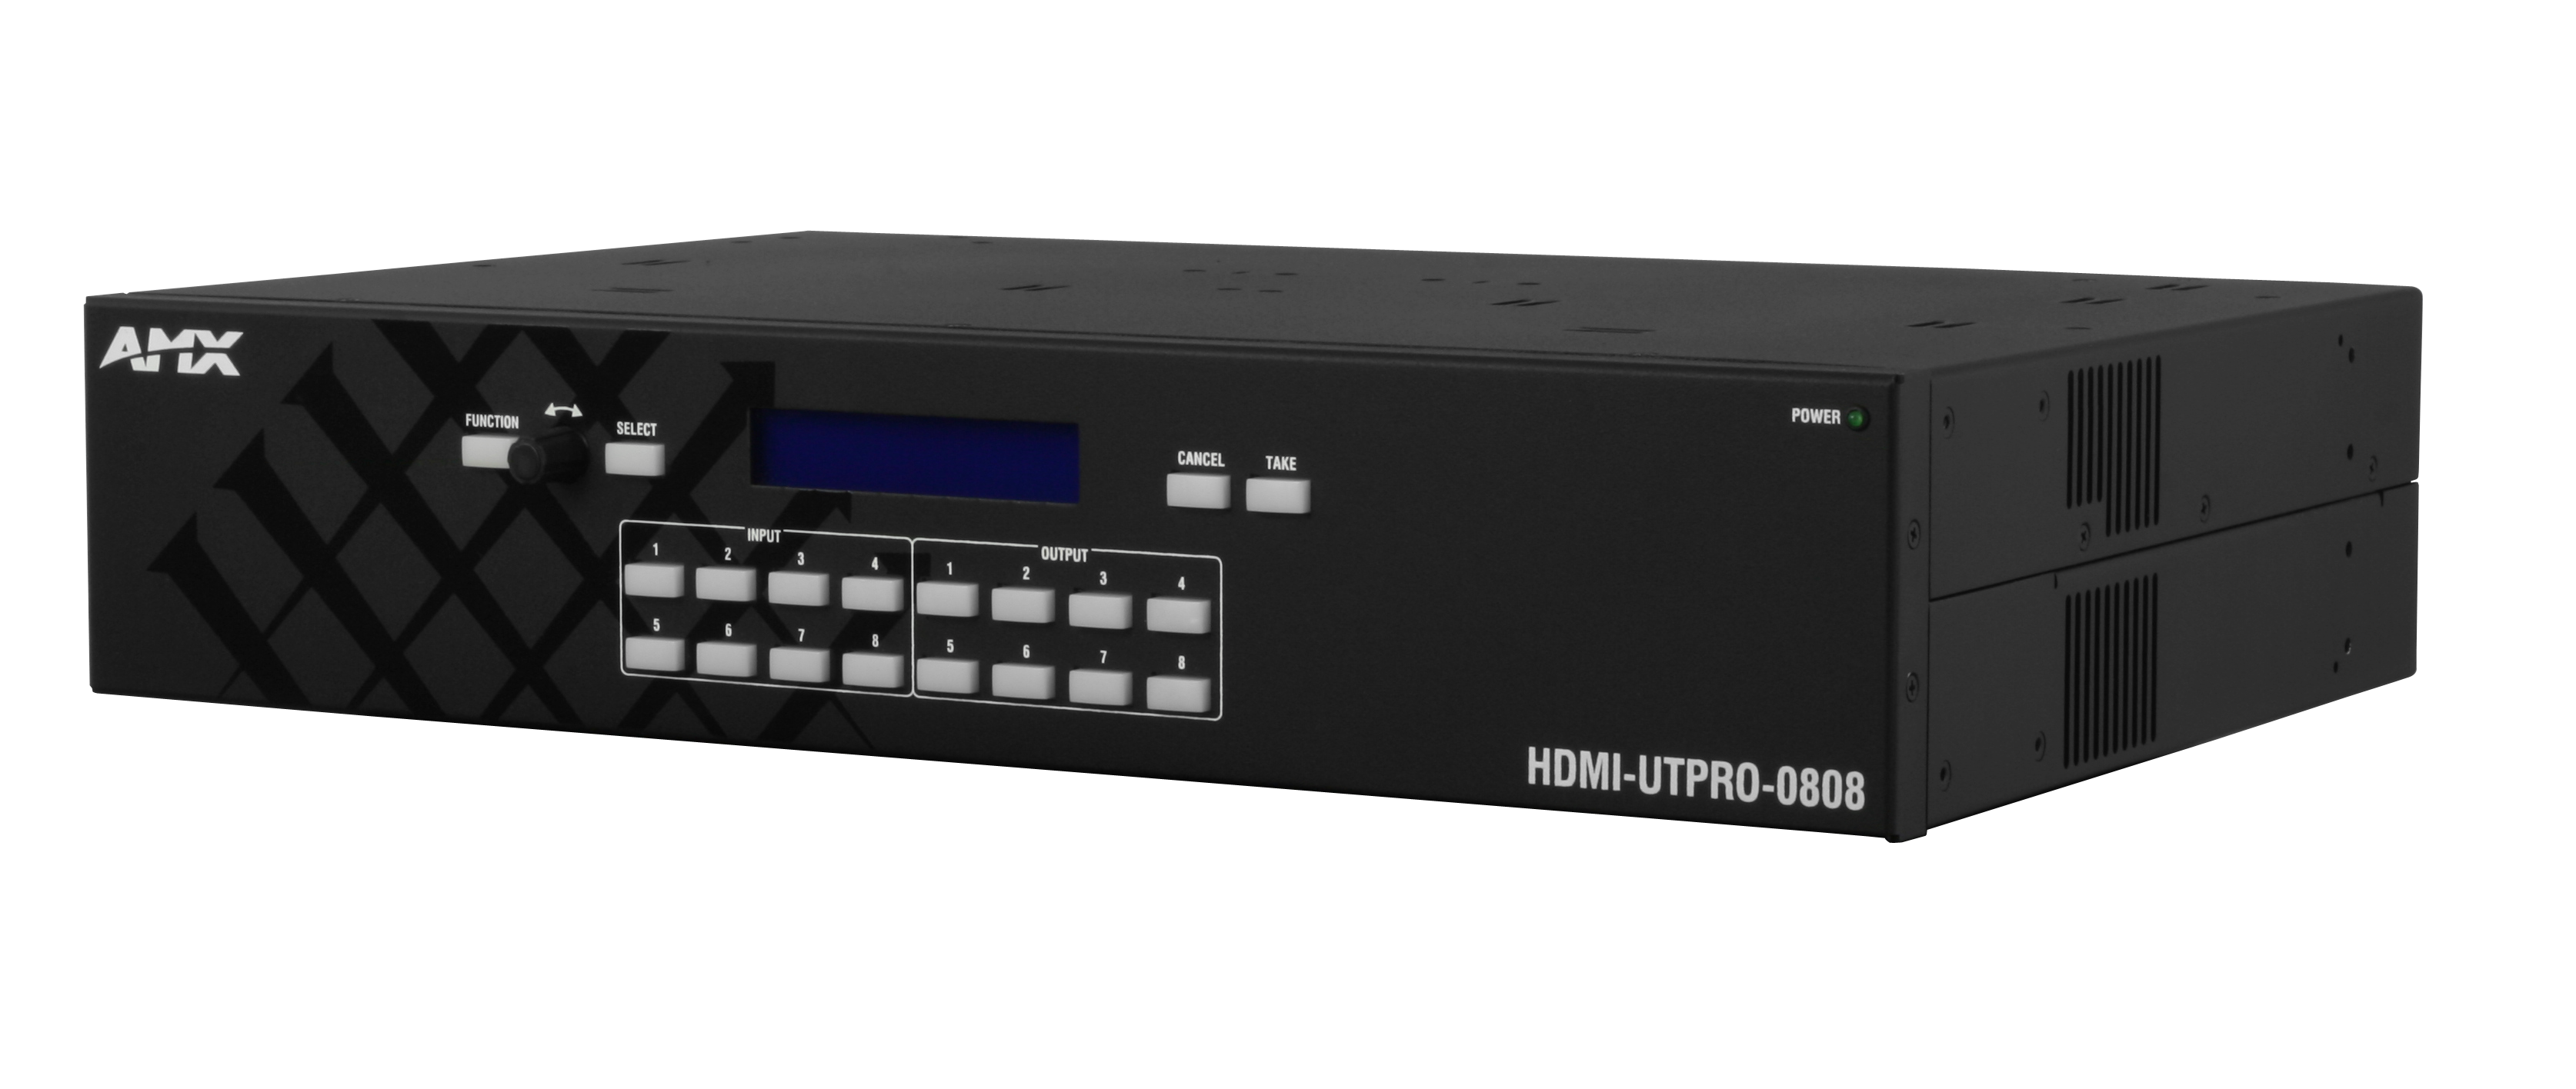 HDMI-UTPRO-0808 Front Left